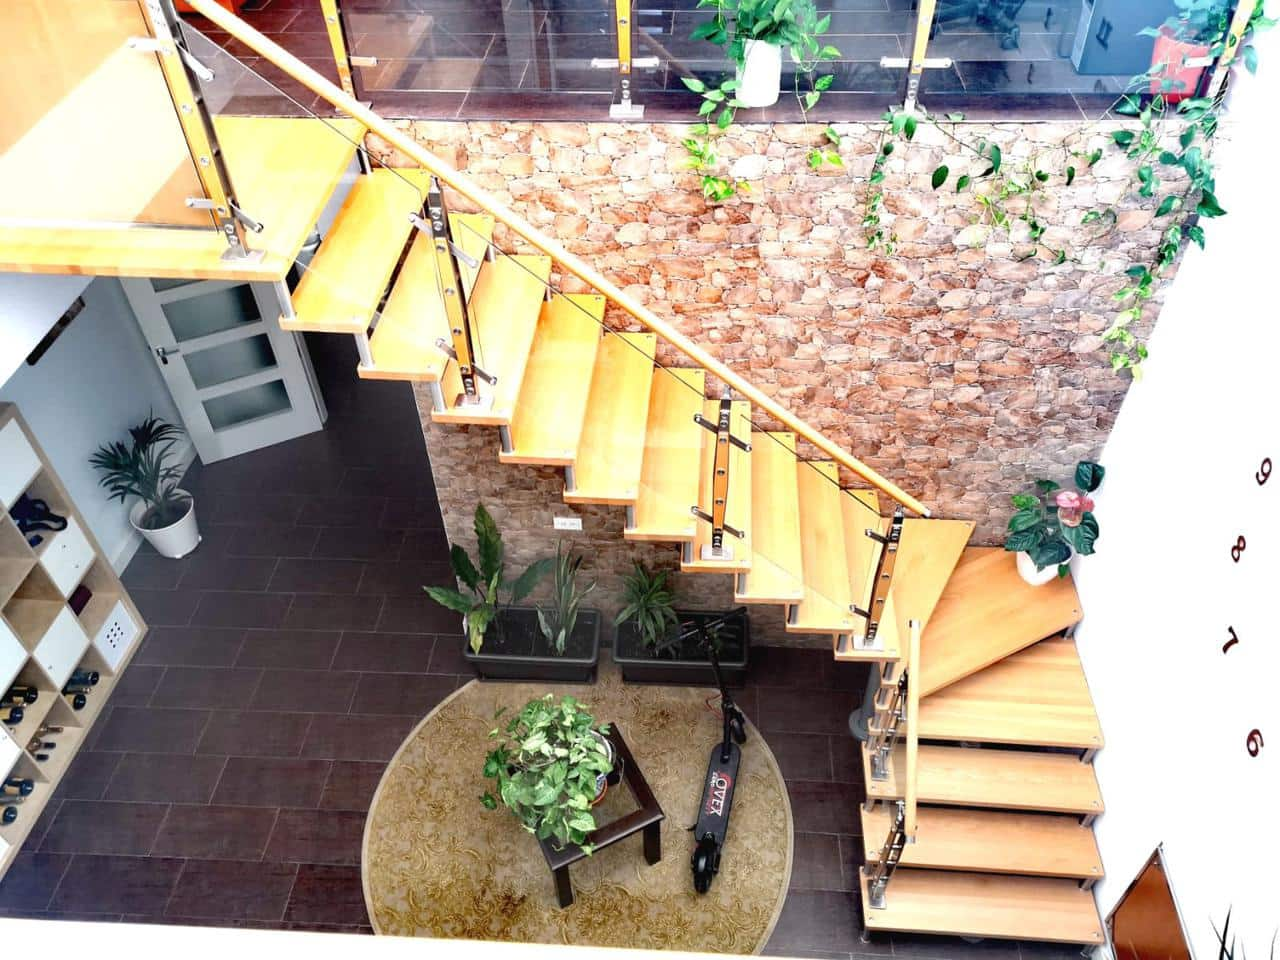 5 Zimmer Villa zu verkaufen in Alcolea del Rio - 240.000 € (Ref: 5600041)